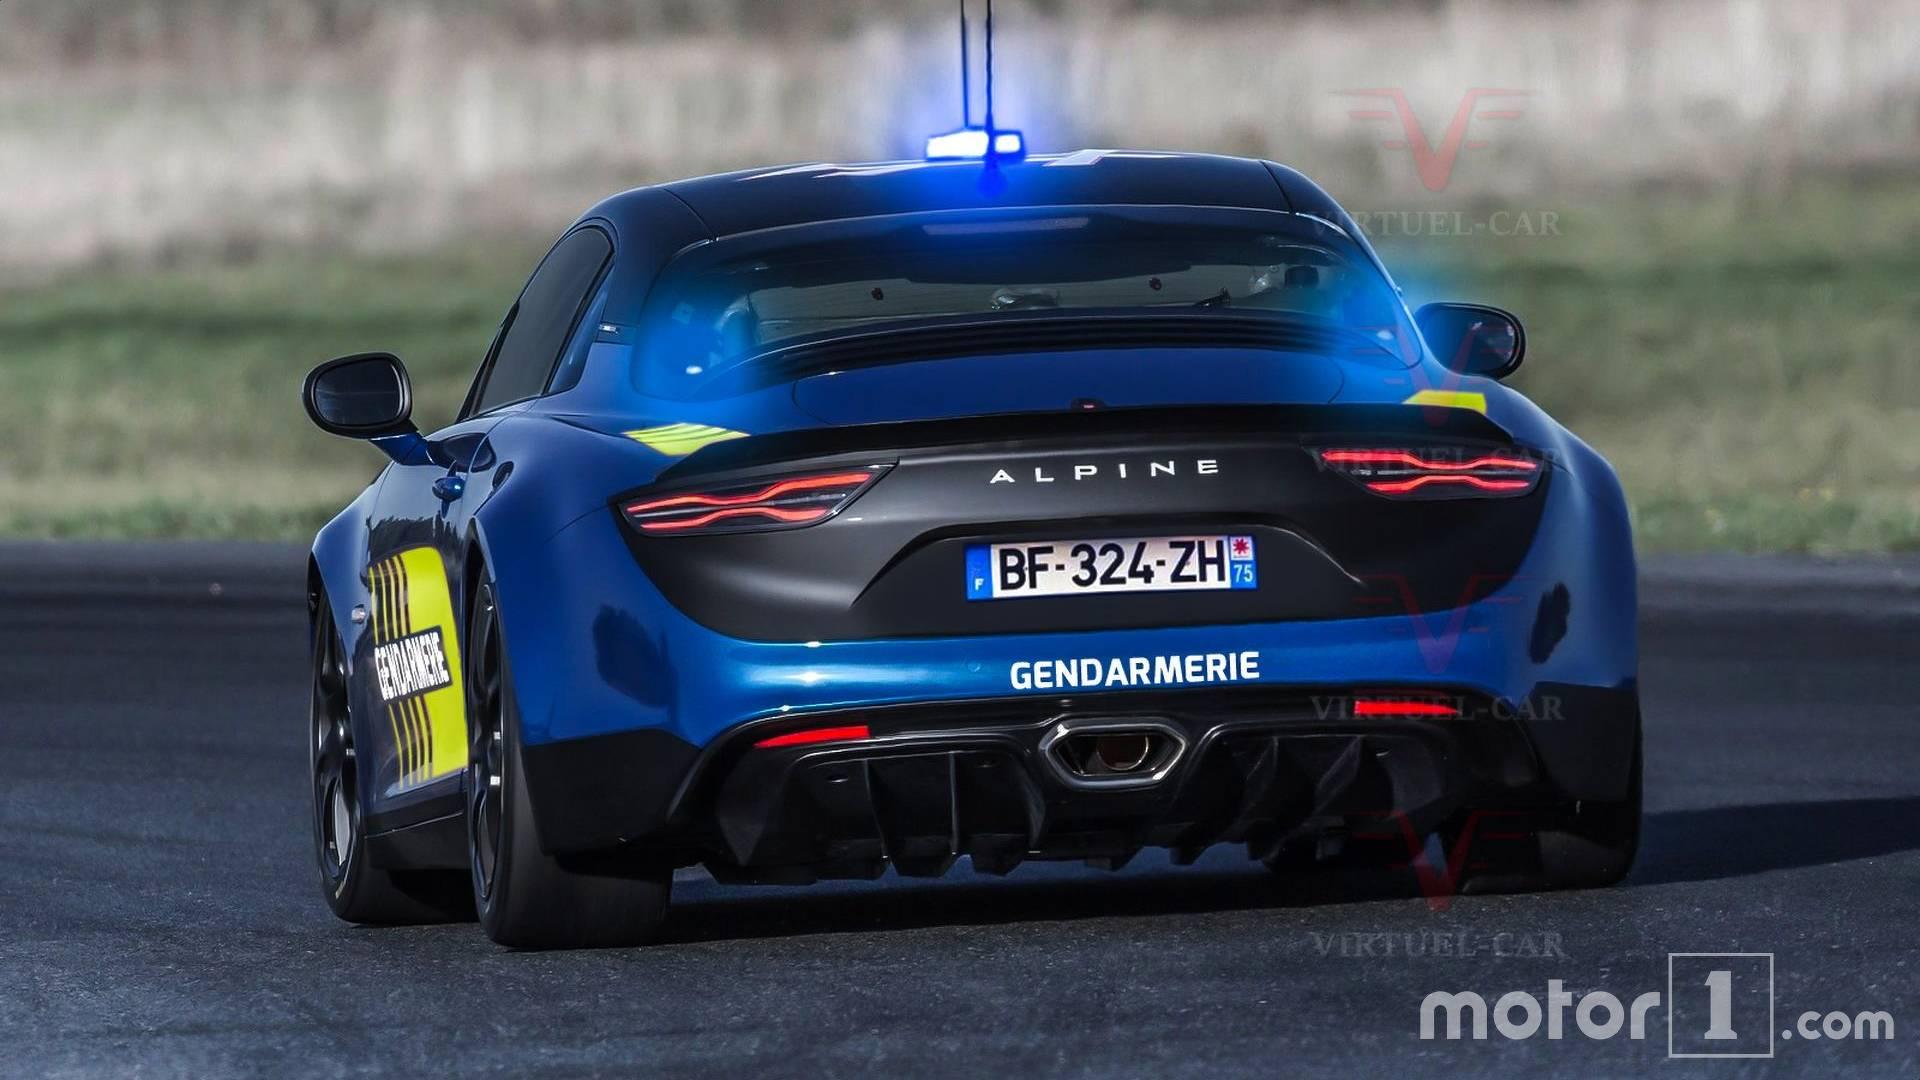 http://cdn.motor1.com/images/mgl/JEEWM/s1/alpine-a110-gendarmerie.jpg